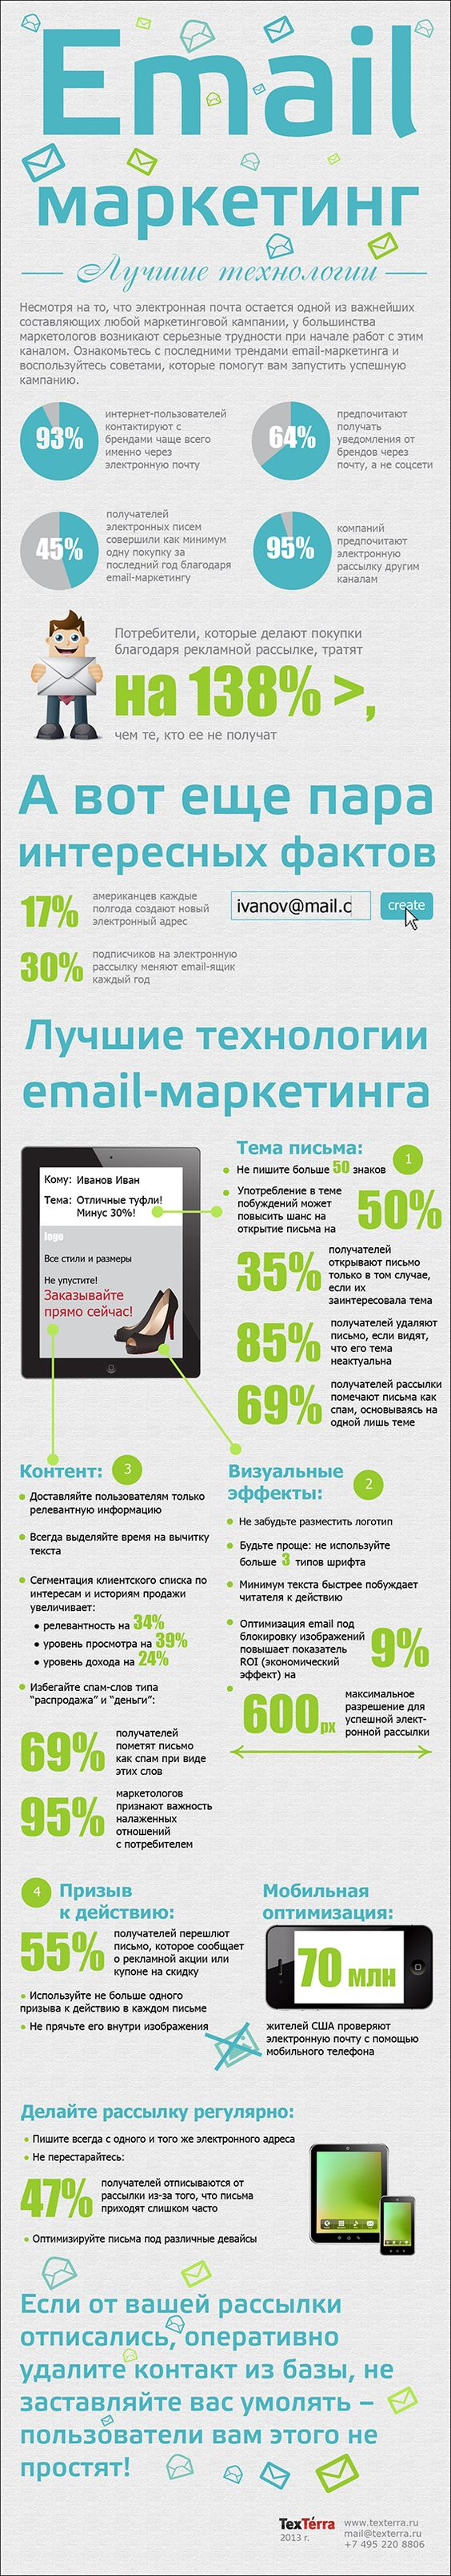 продающий e-mail маркетинг инфографика